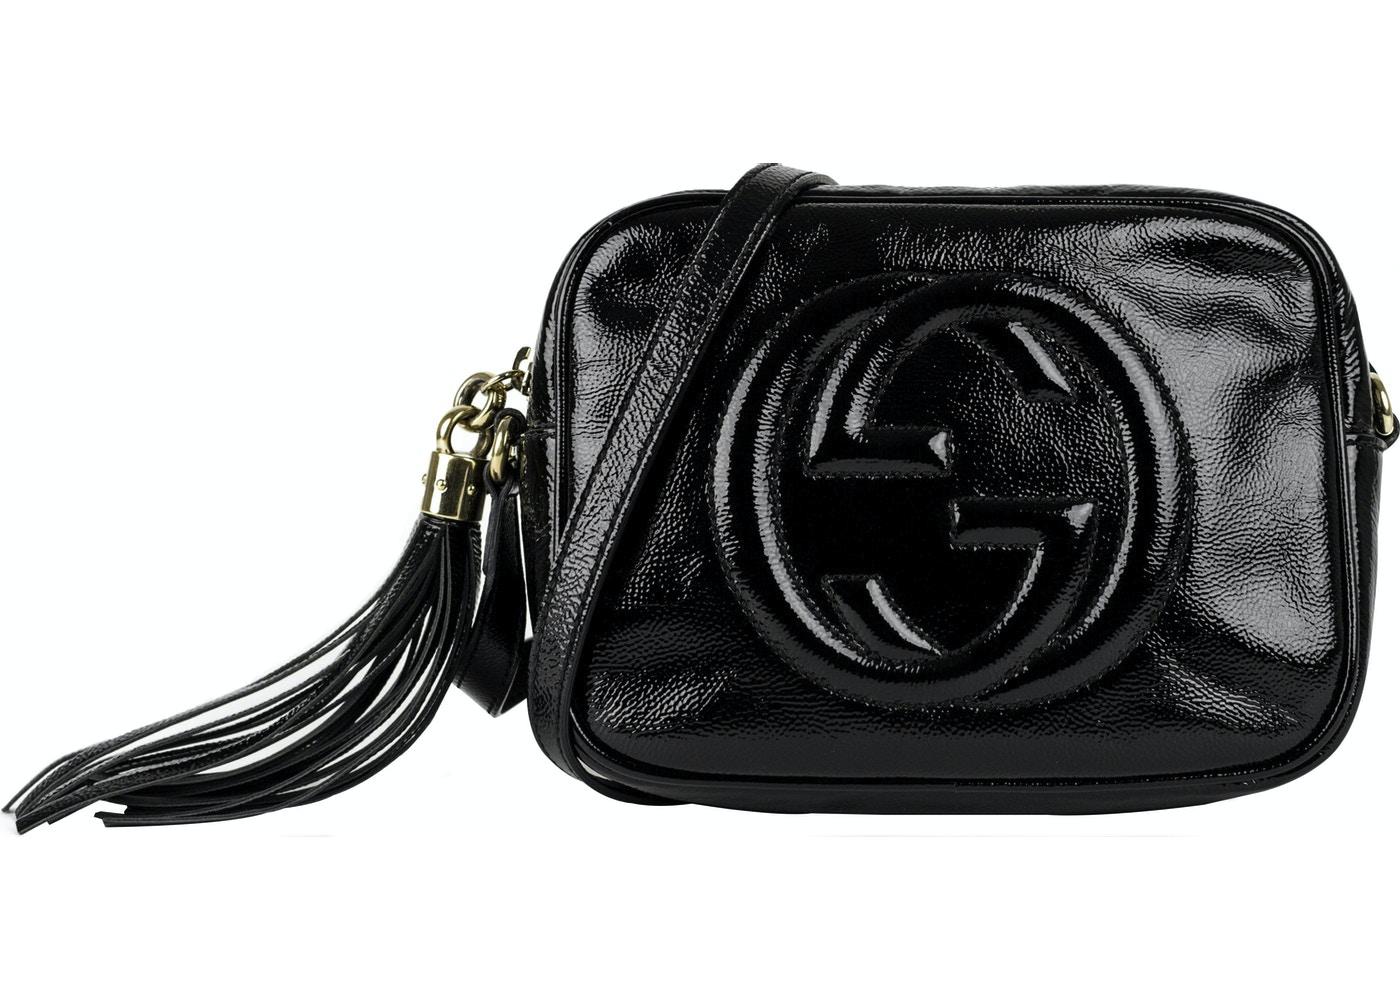 63f310ae79d Gucci Patent Leather Soho Disco Black. Black